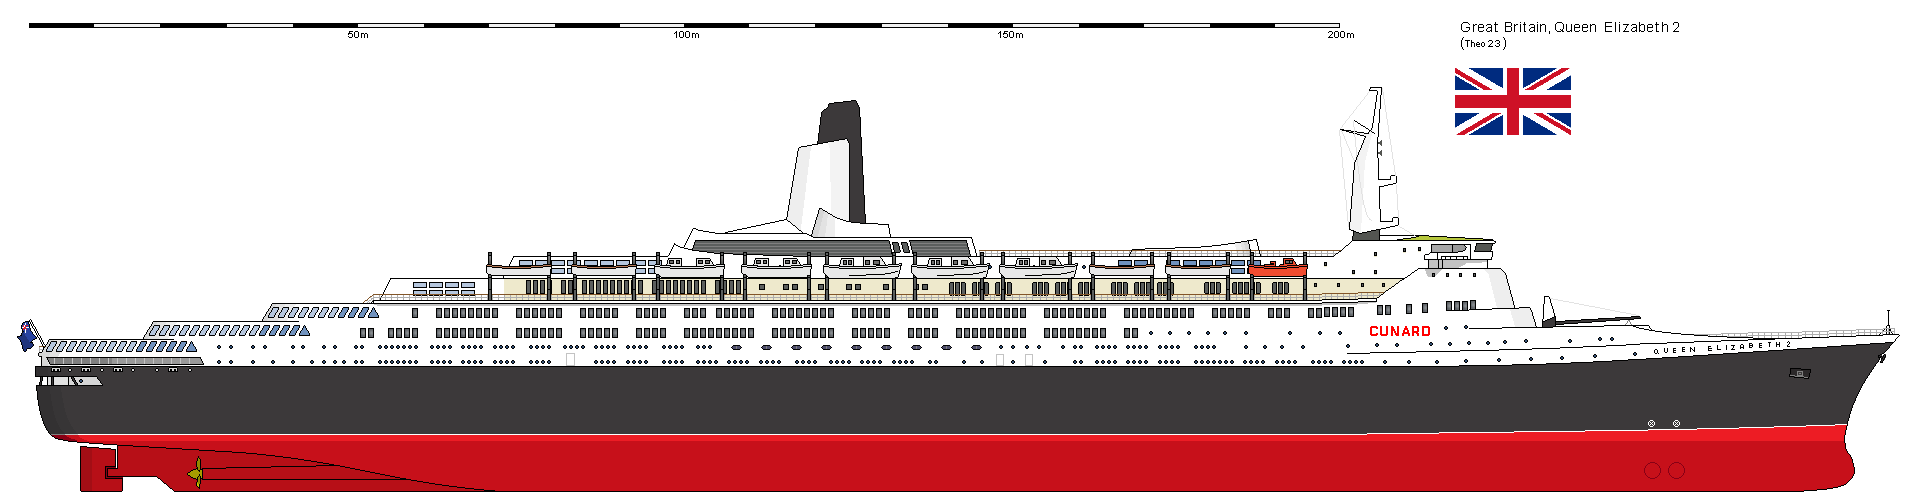 Andrea doria deck plans google search travel ocean liners andrea doria deck plans google search baanklon Gallery